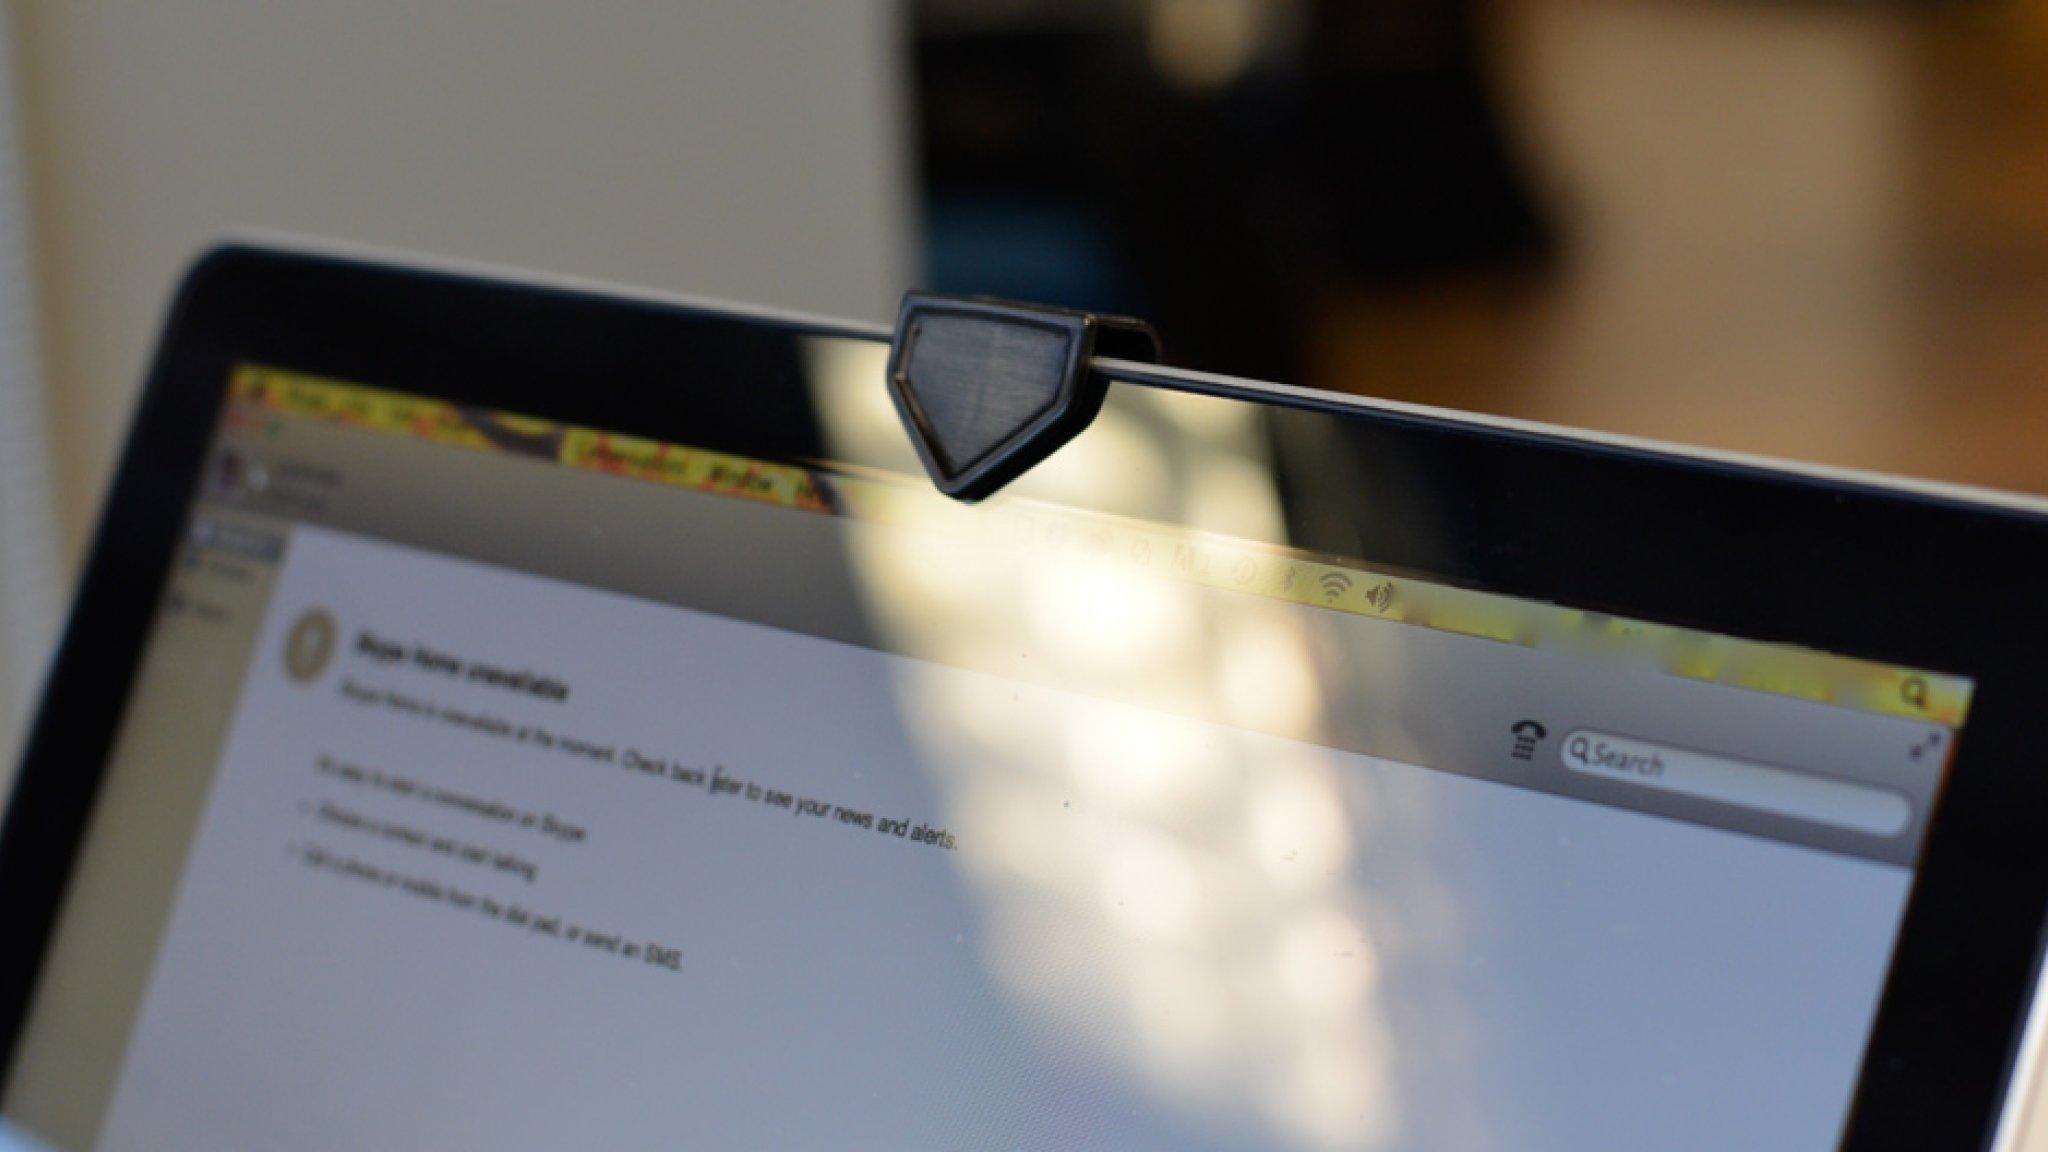 Teil 1: iPhone Fernzugriff per Spionage App Spyize